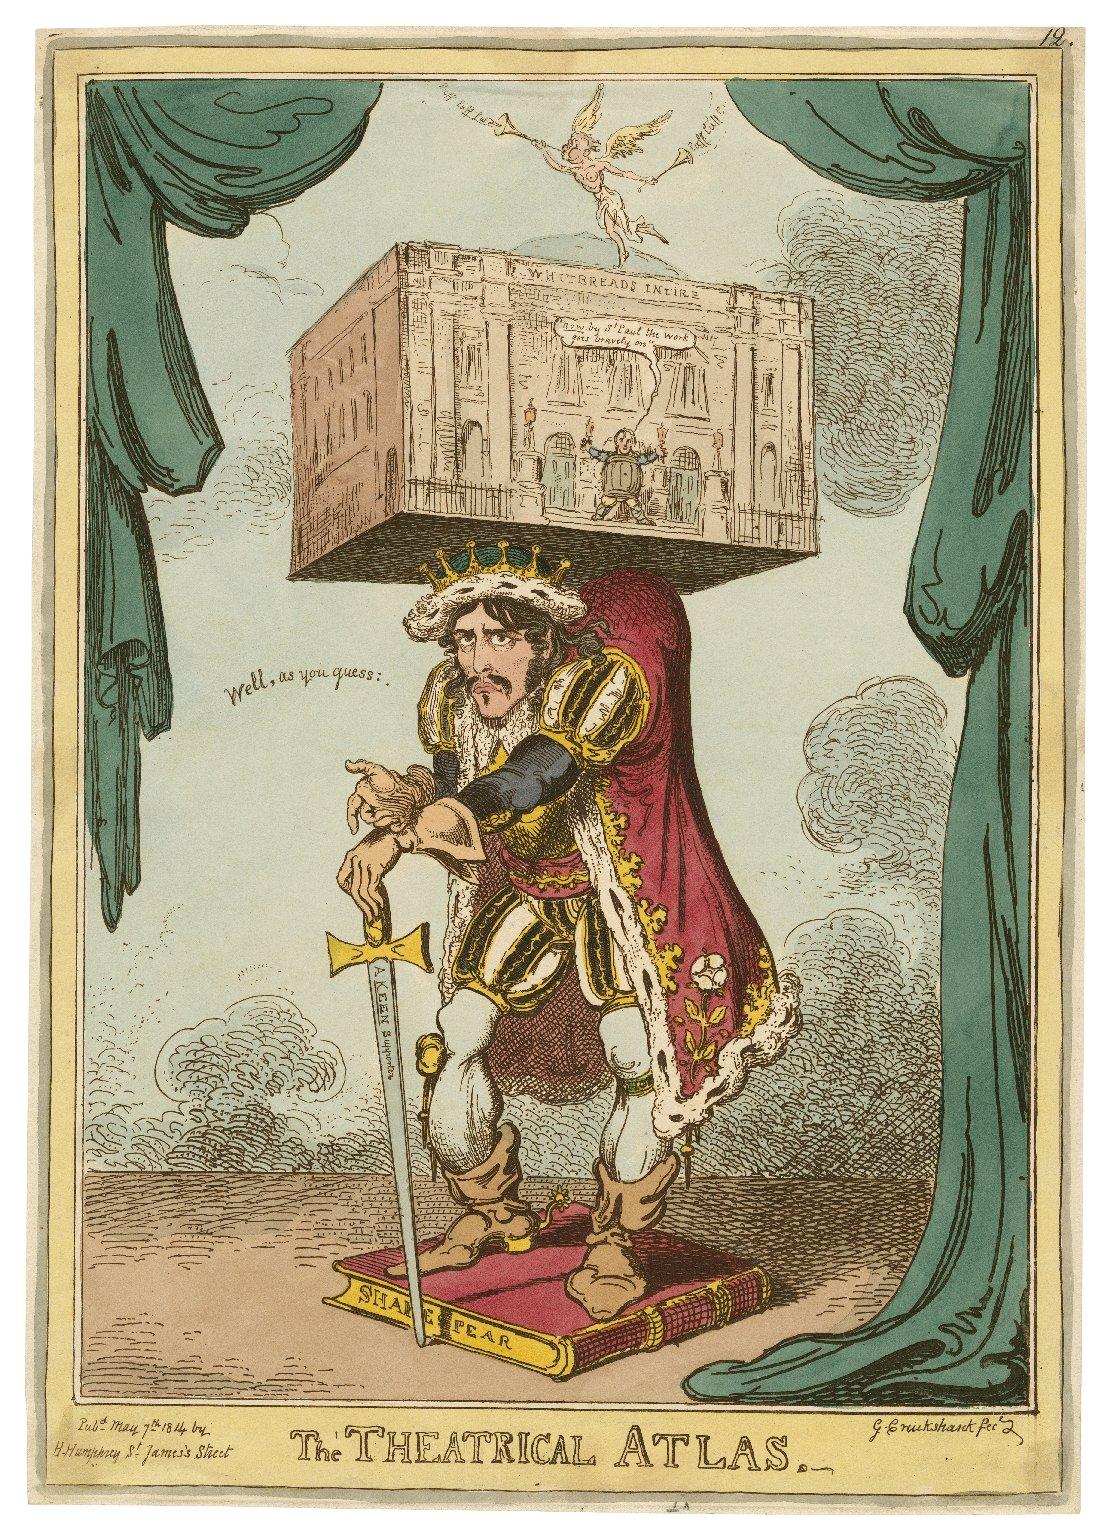 The theatrical atlas [graphic] / G. Cruikshank fec.